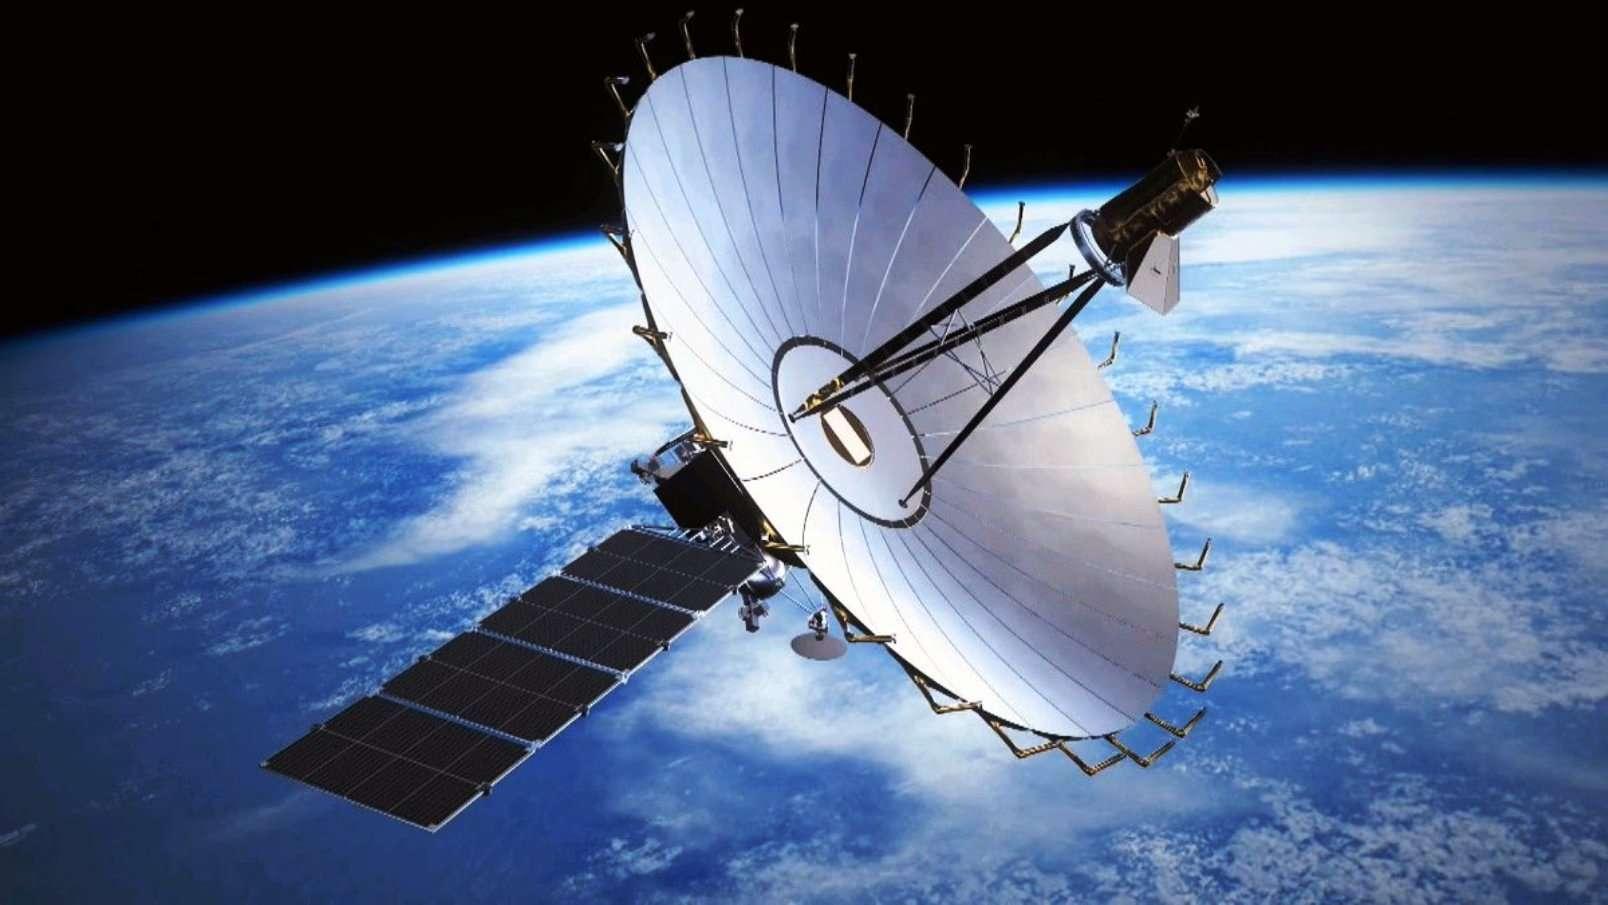 La Russie a perdu le contrôle de son radiotélescope spatial Spektr-R, ou RadioAstron. © Lebedev Institute